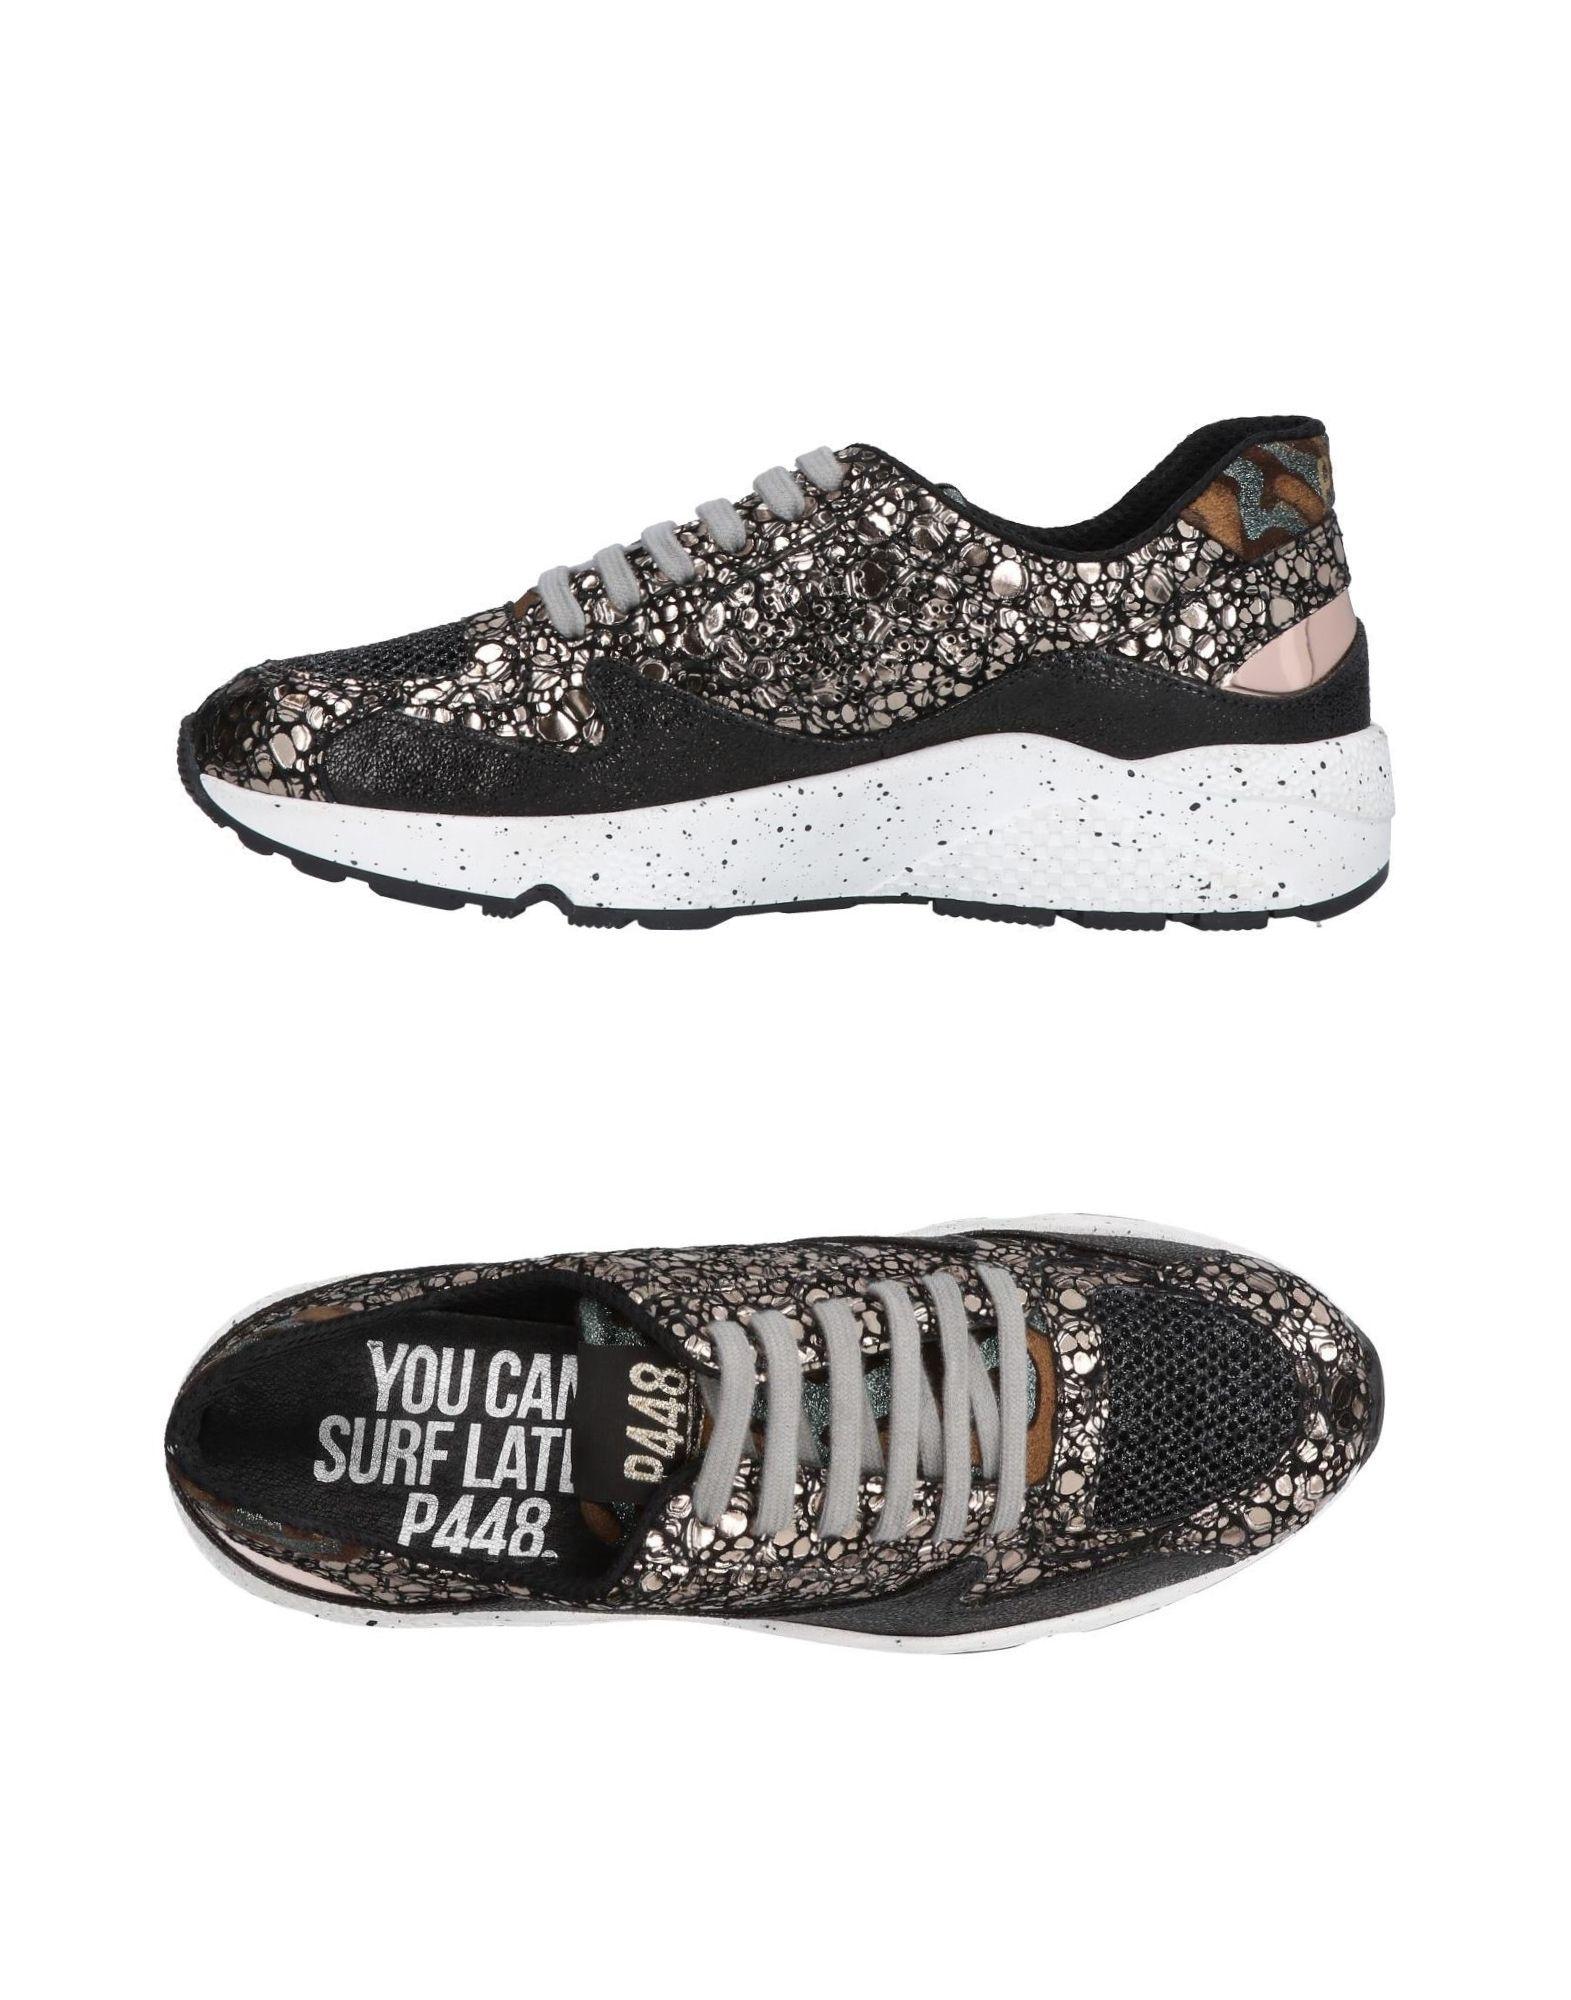 Moda Sneakers P448 Donna - 11458507AC